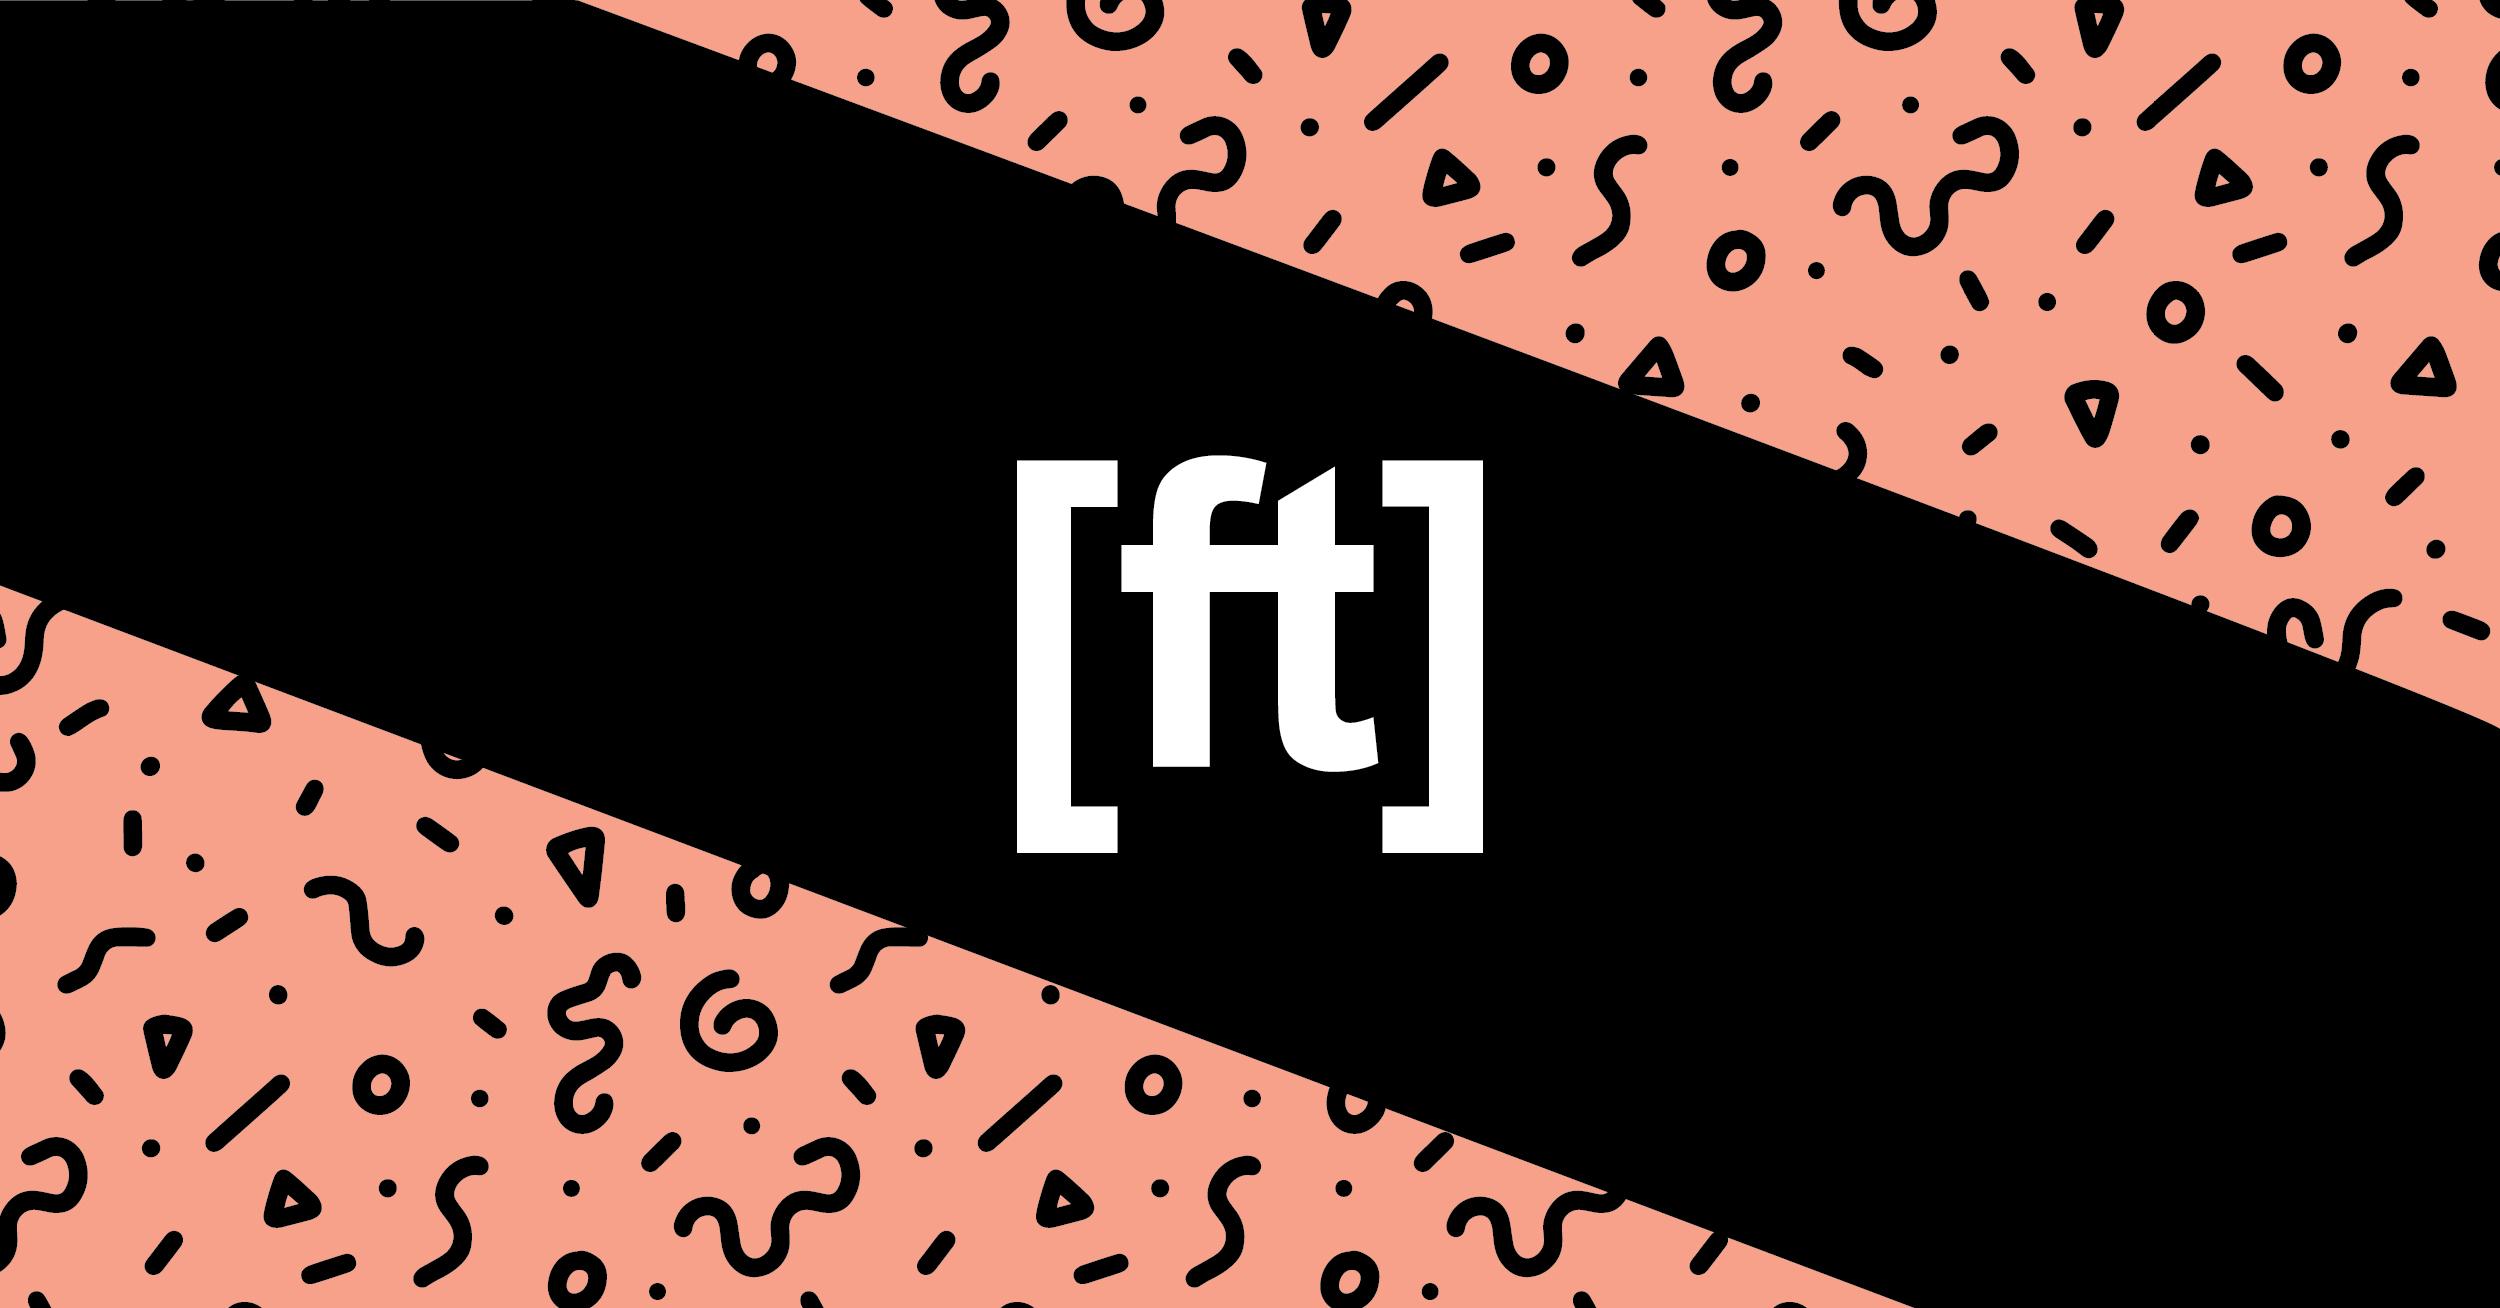 ft-fb-thm.jpg